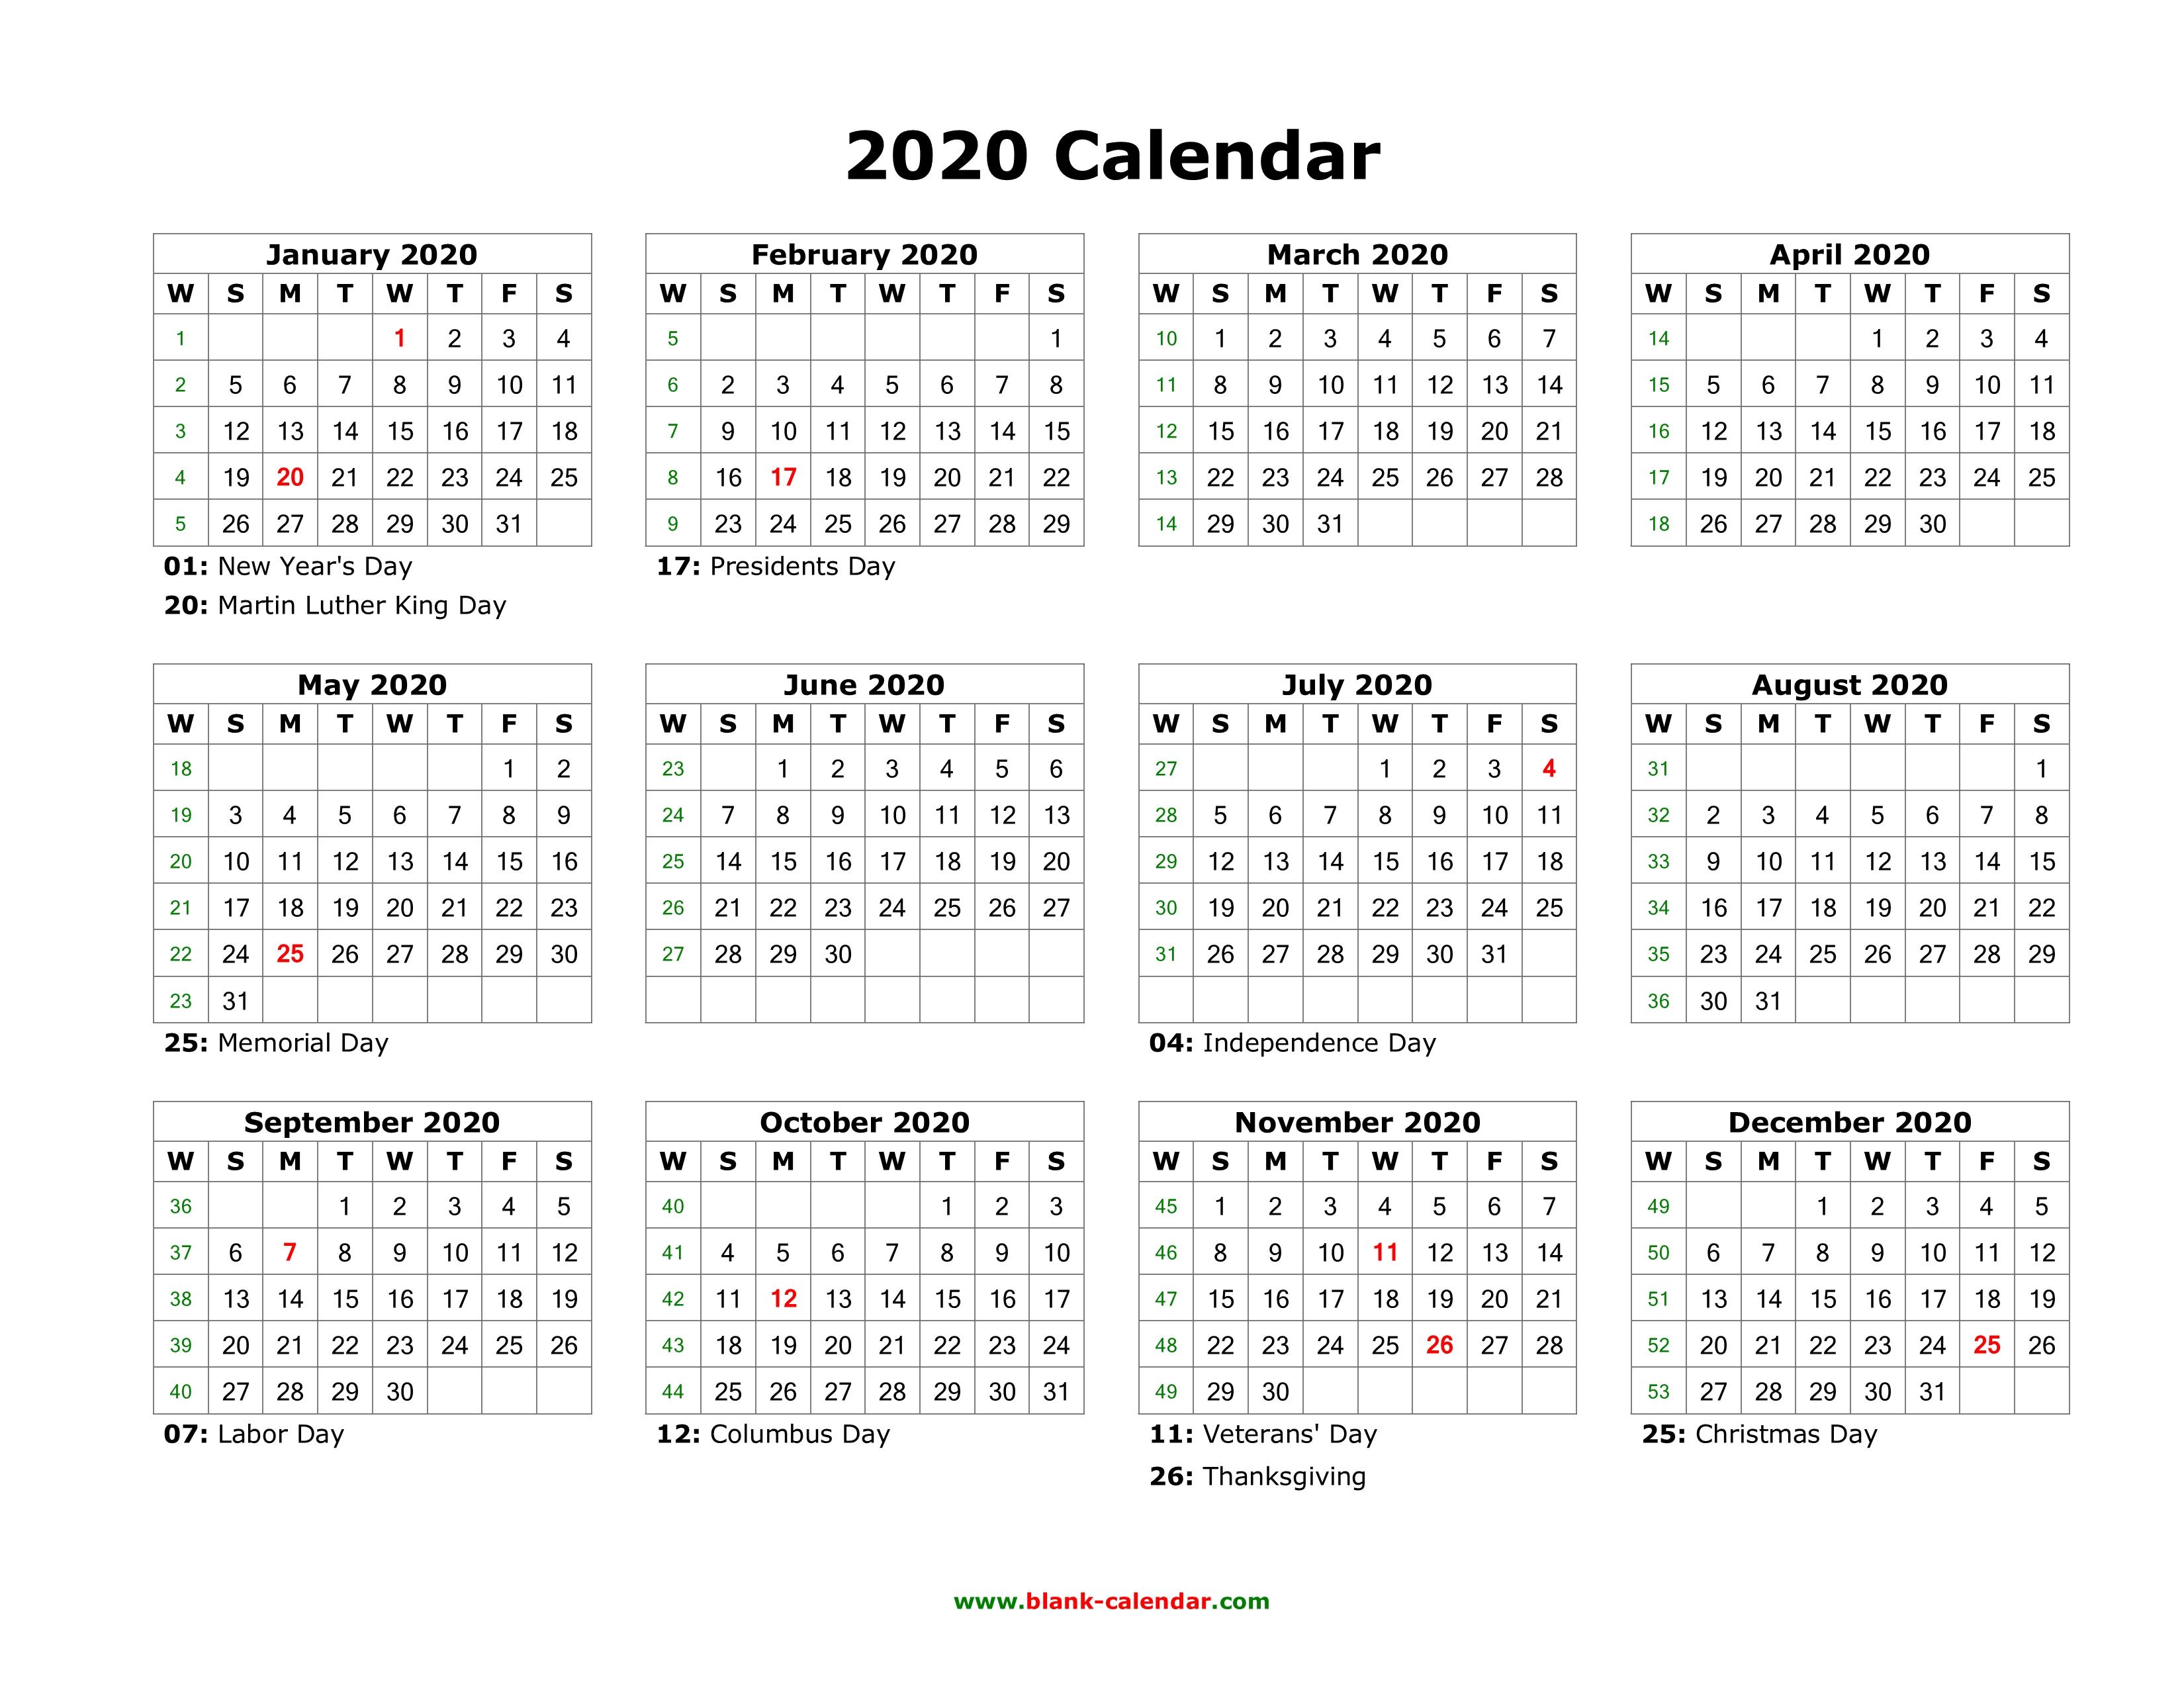 Blank Calendar 2020 | Free Download Calendar Templates within Blank 2020 Calendars To Edit